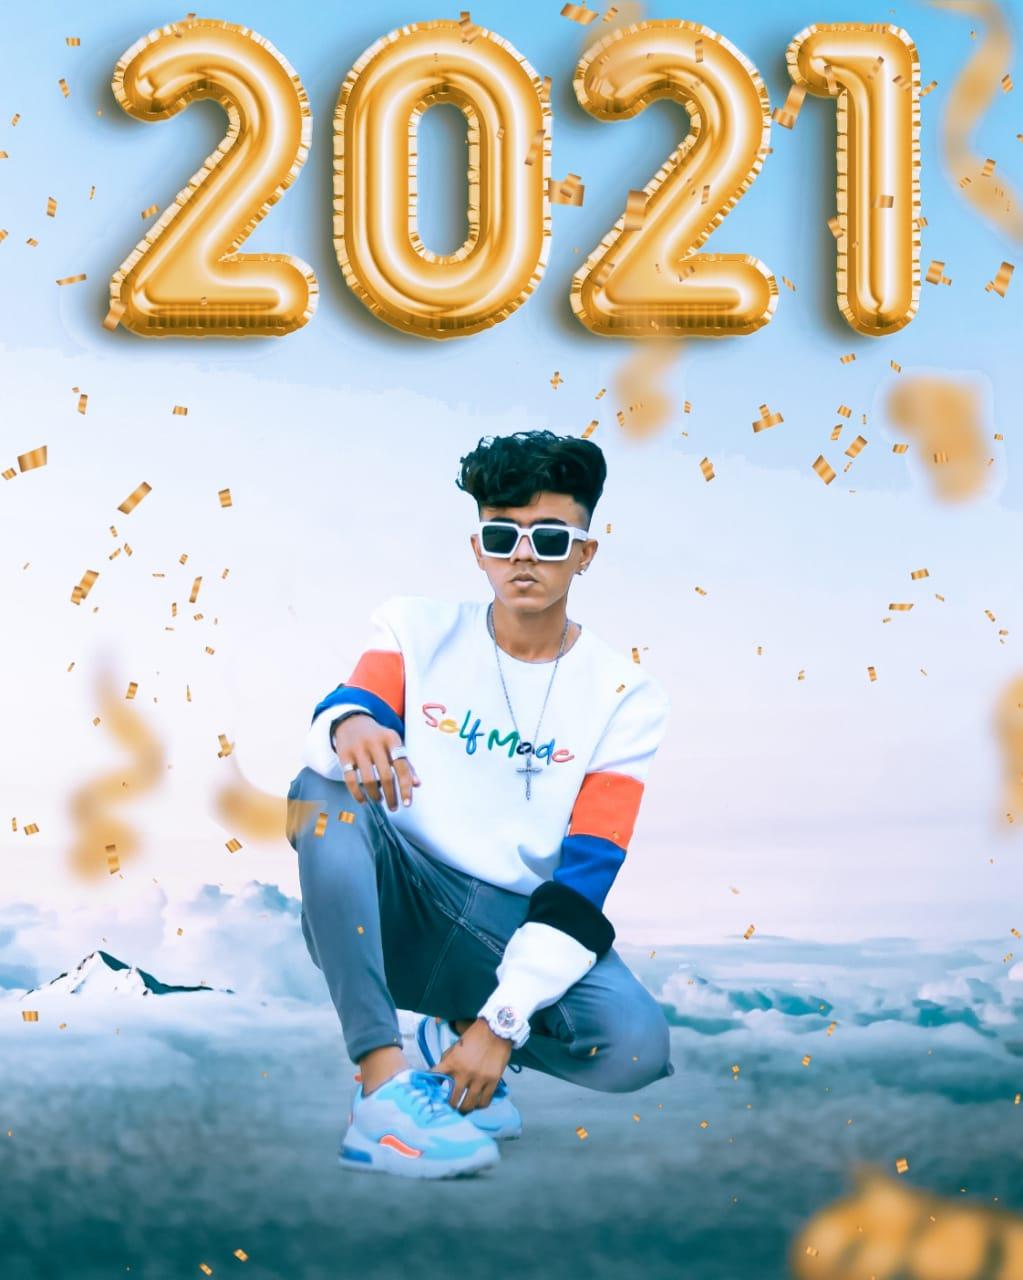 New Year Photo Editing